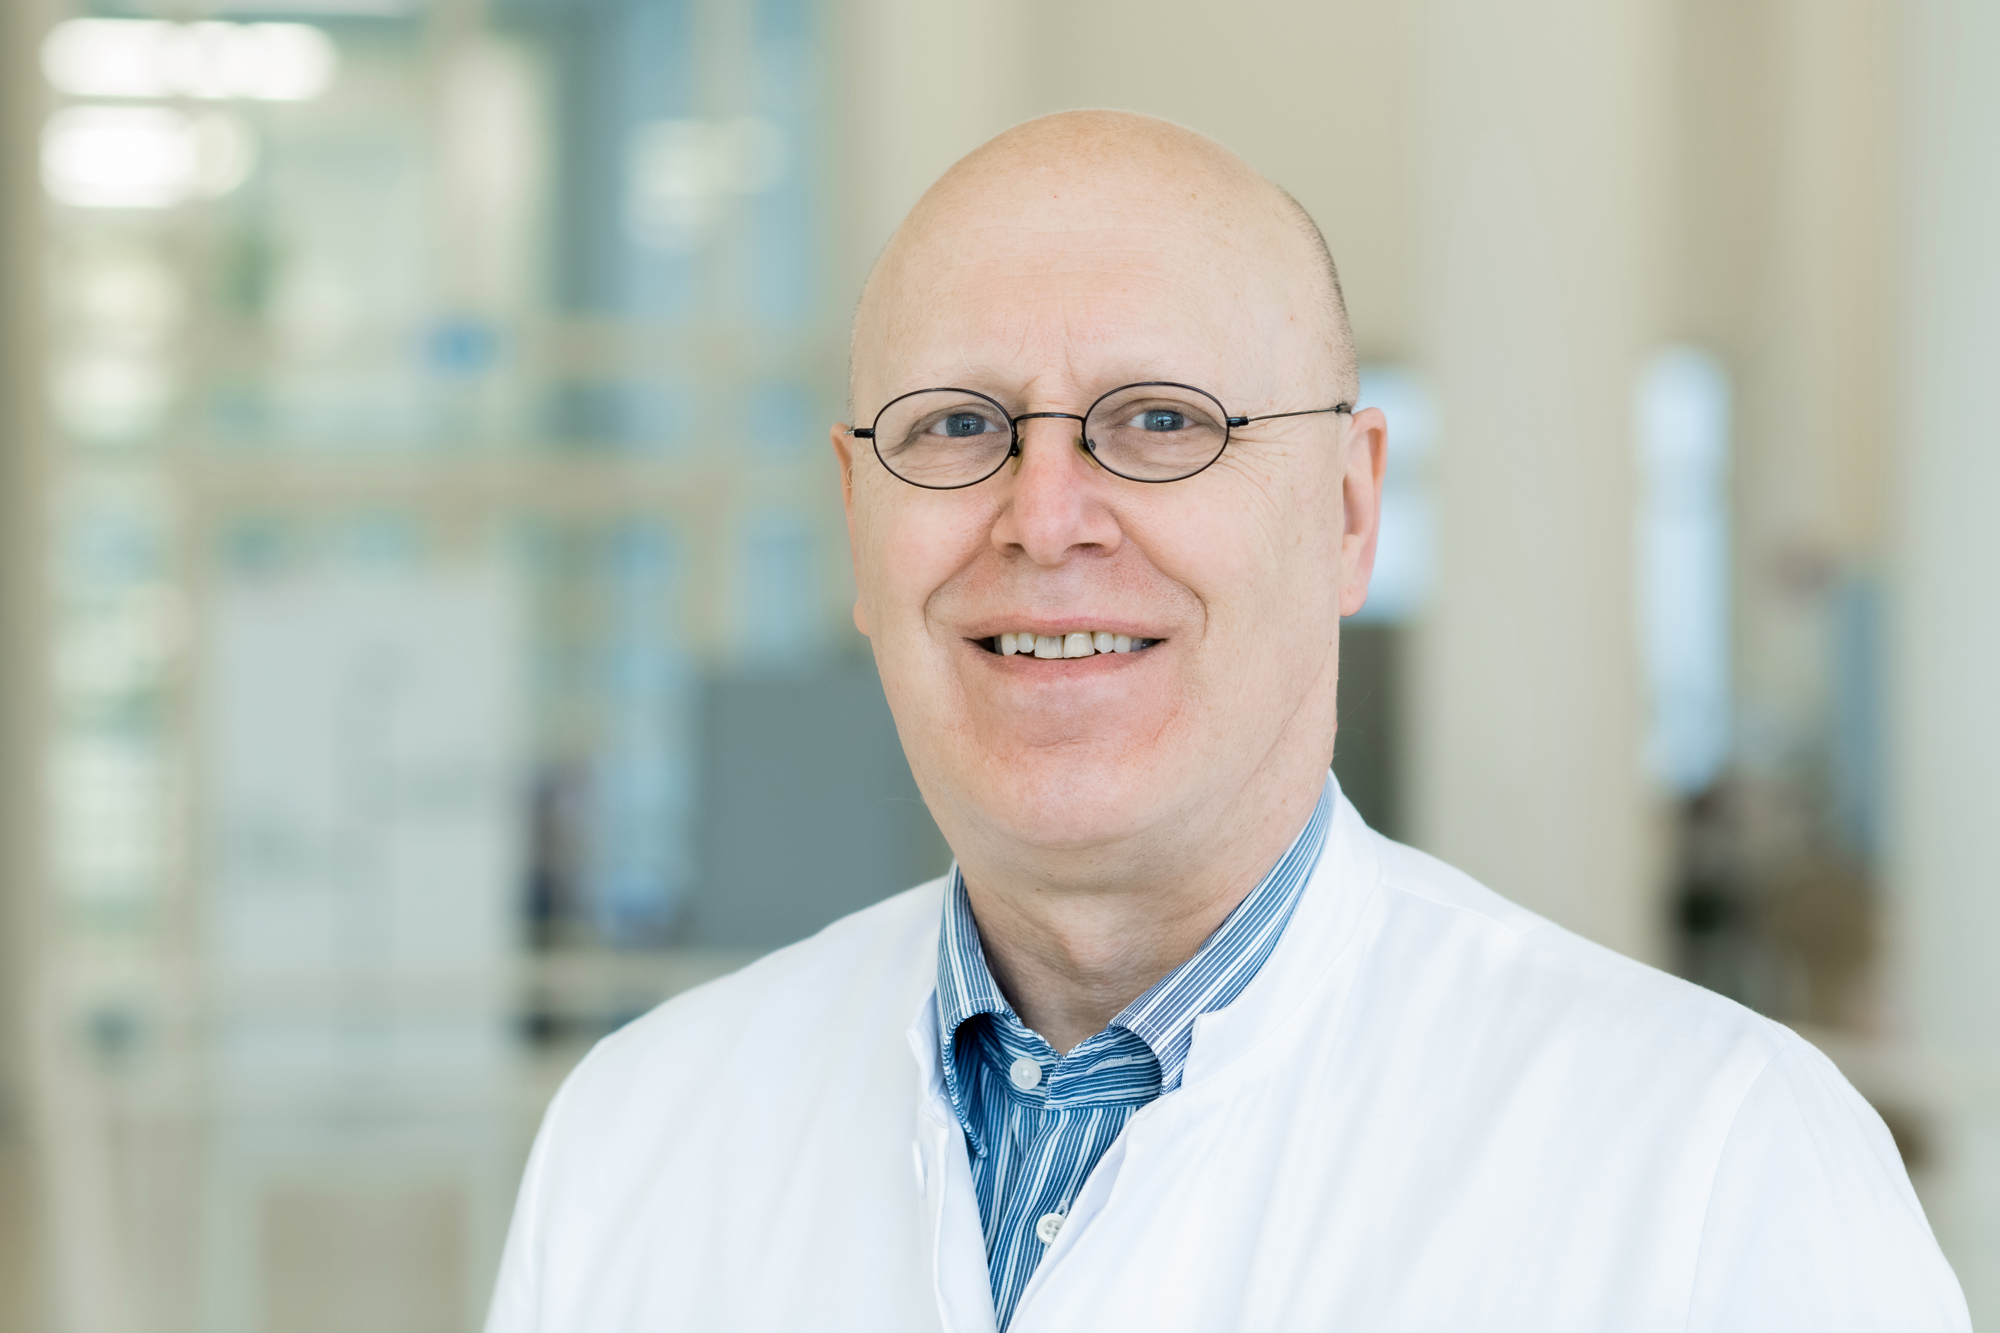 Prof. Dr. med. Dipl.-Biol. Michael Koldehoff